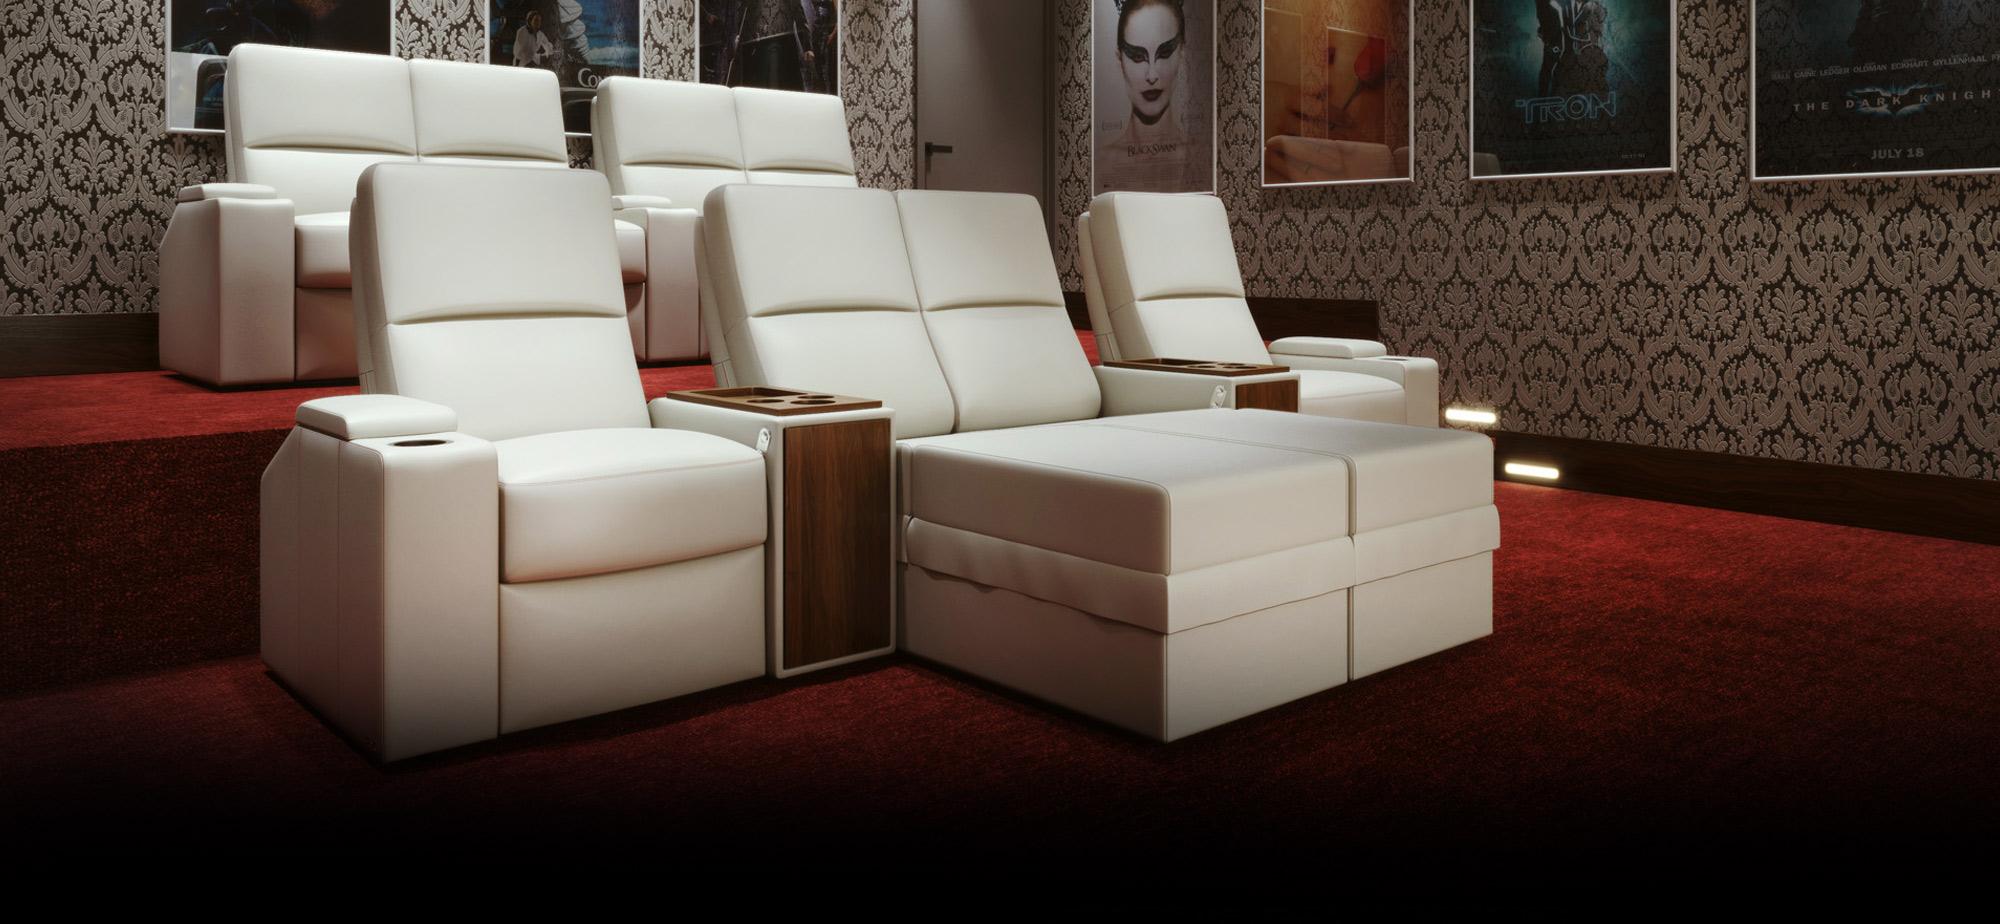 Cinema Sofa Bed With Docking Station Sofa The Honoroak